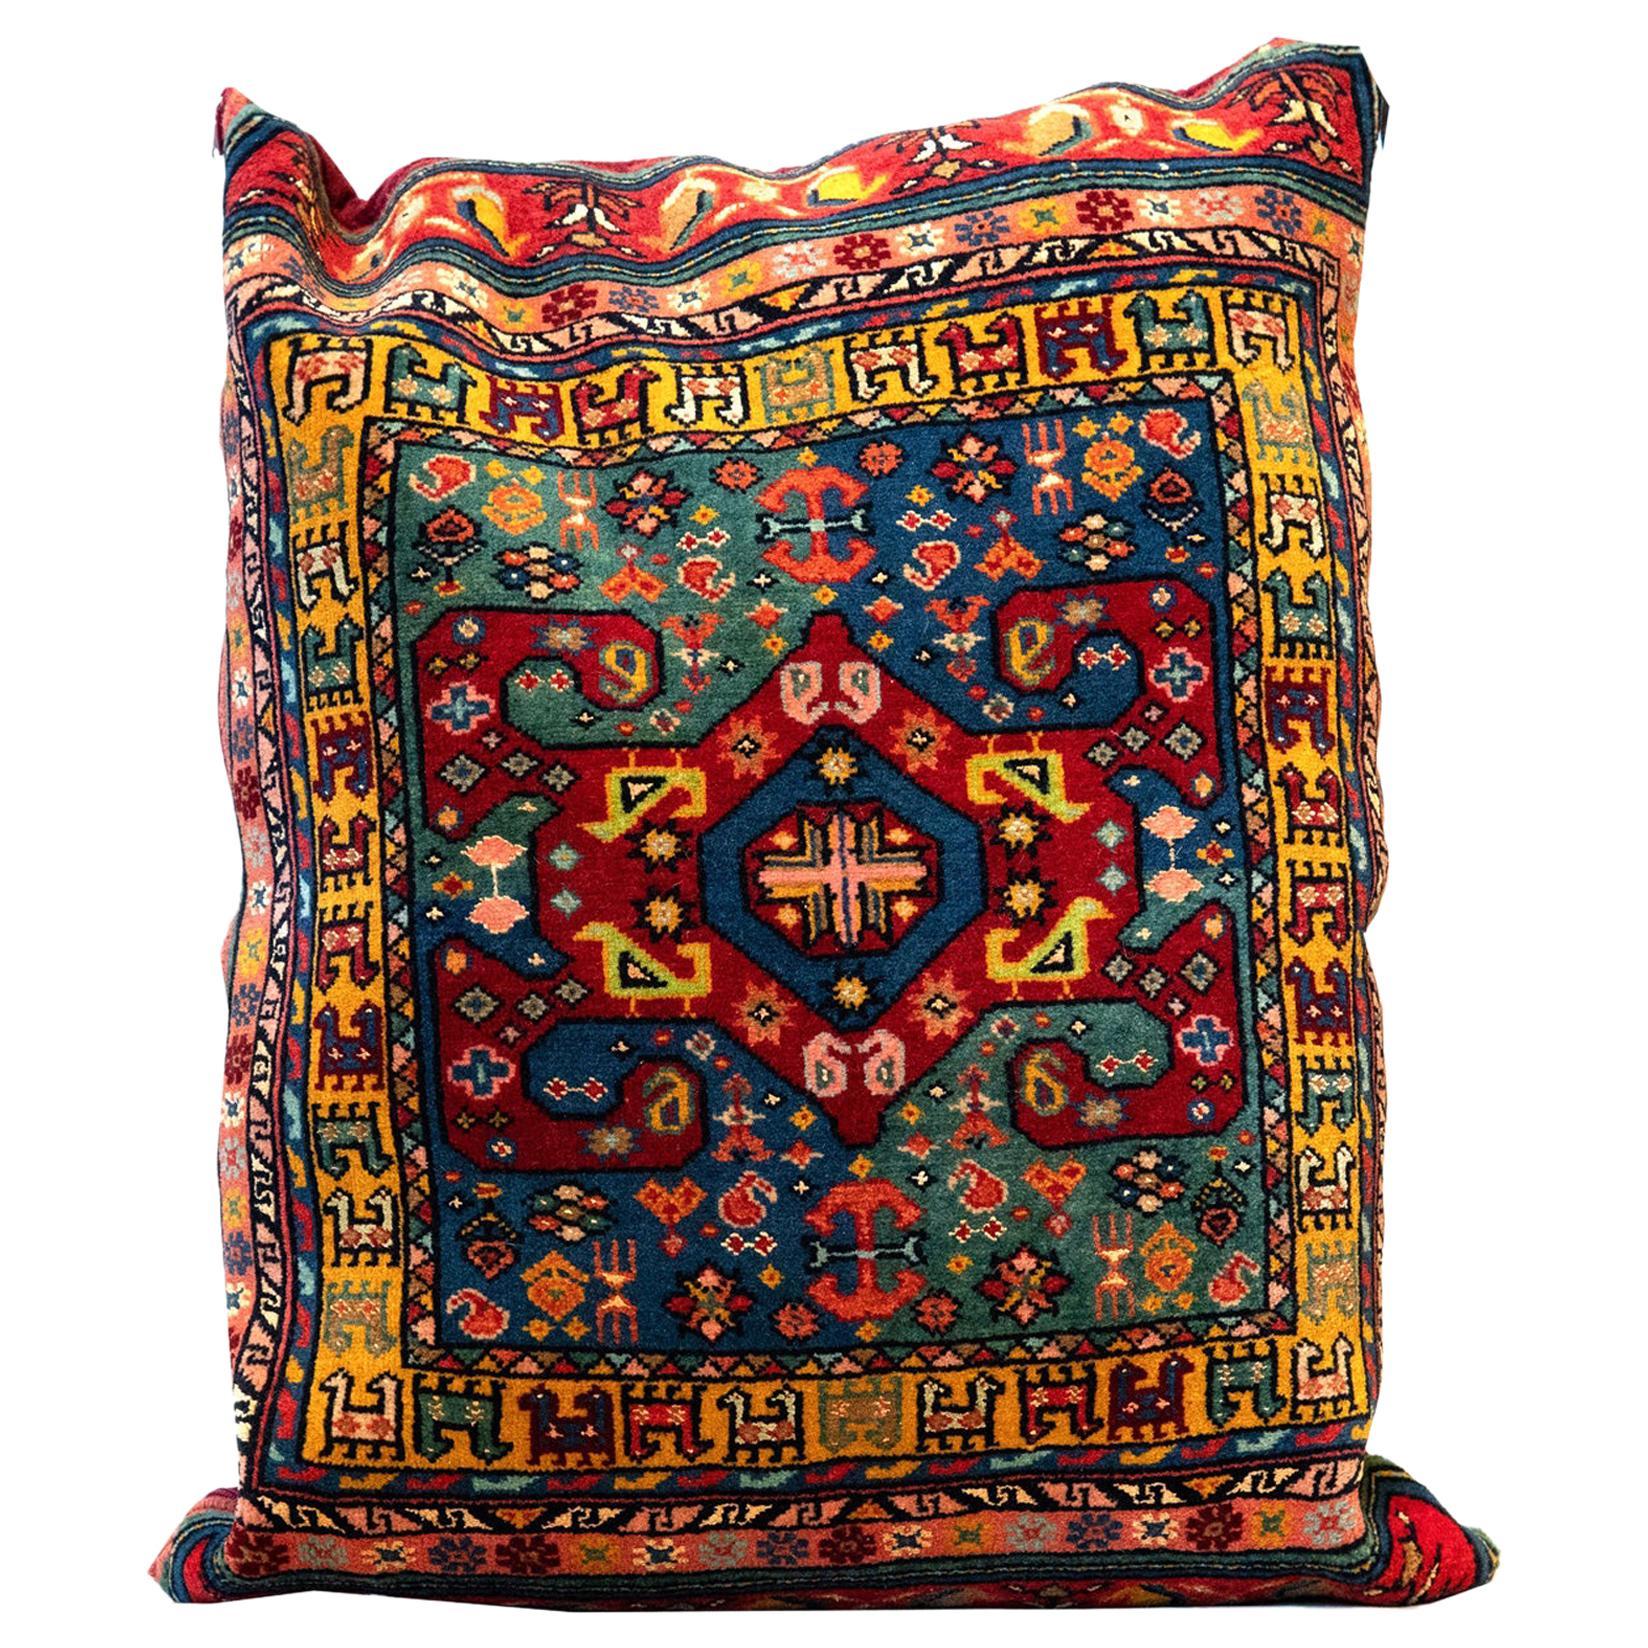 Handmade Tribal Pillow Cover, Traditional Pillow Carpet Floor Cushion